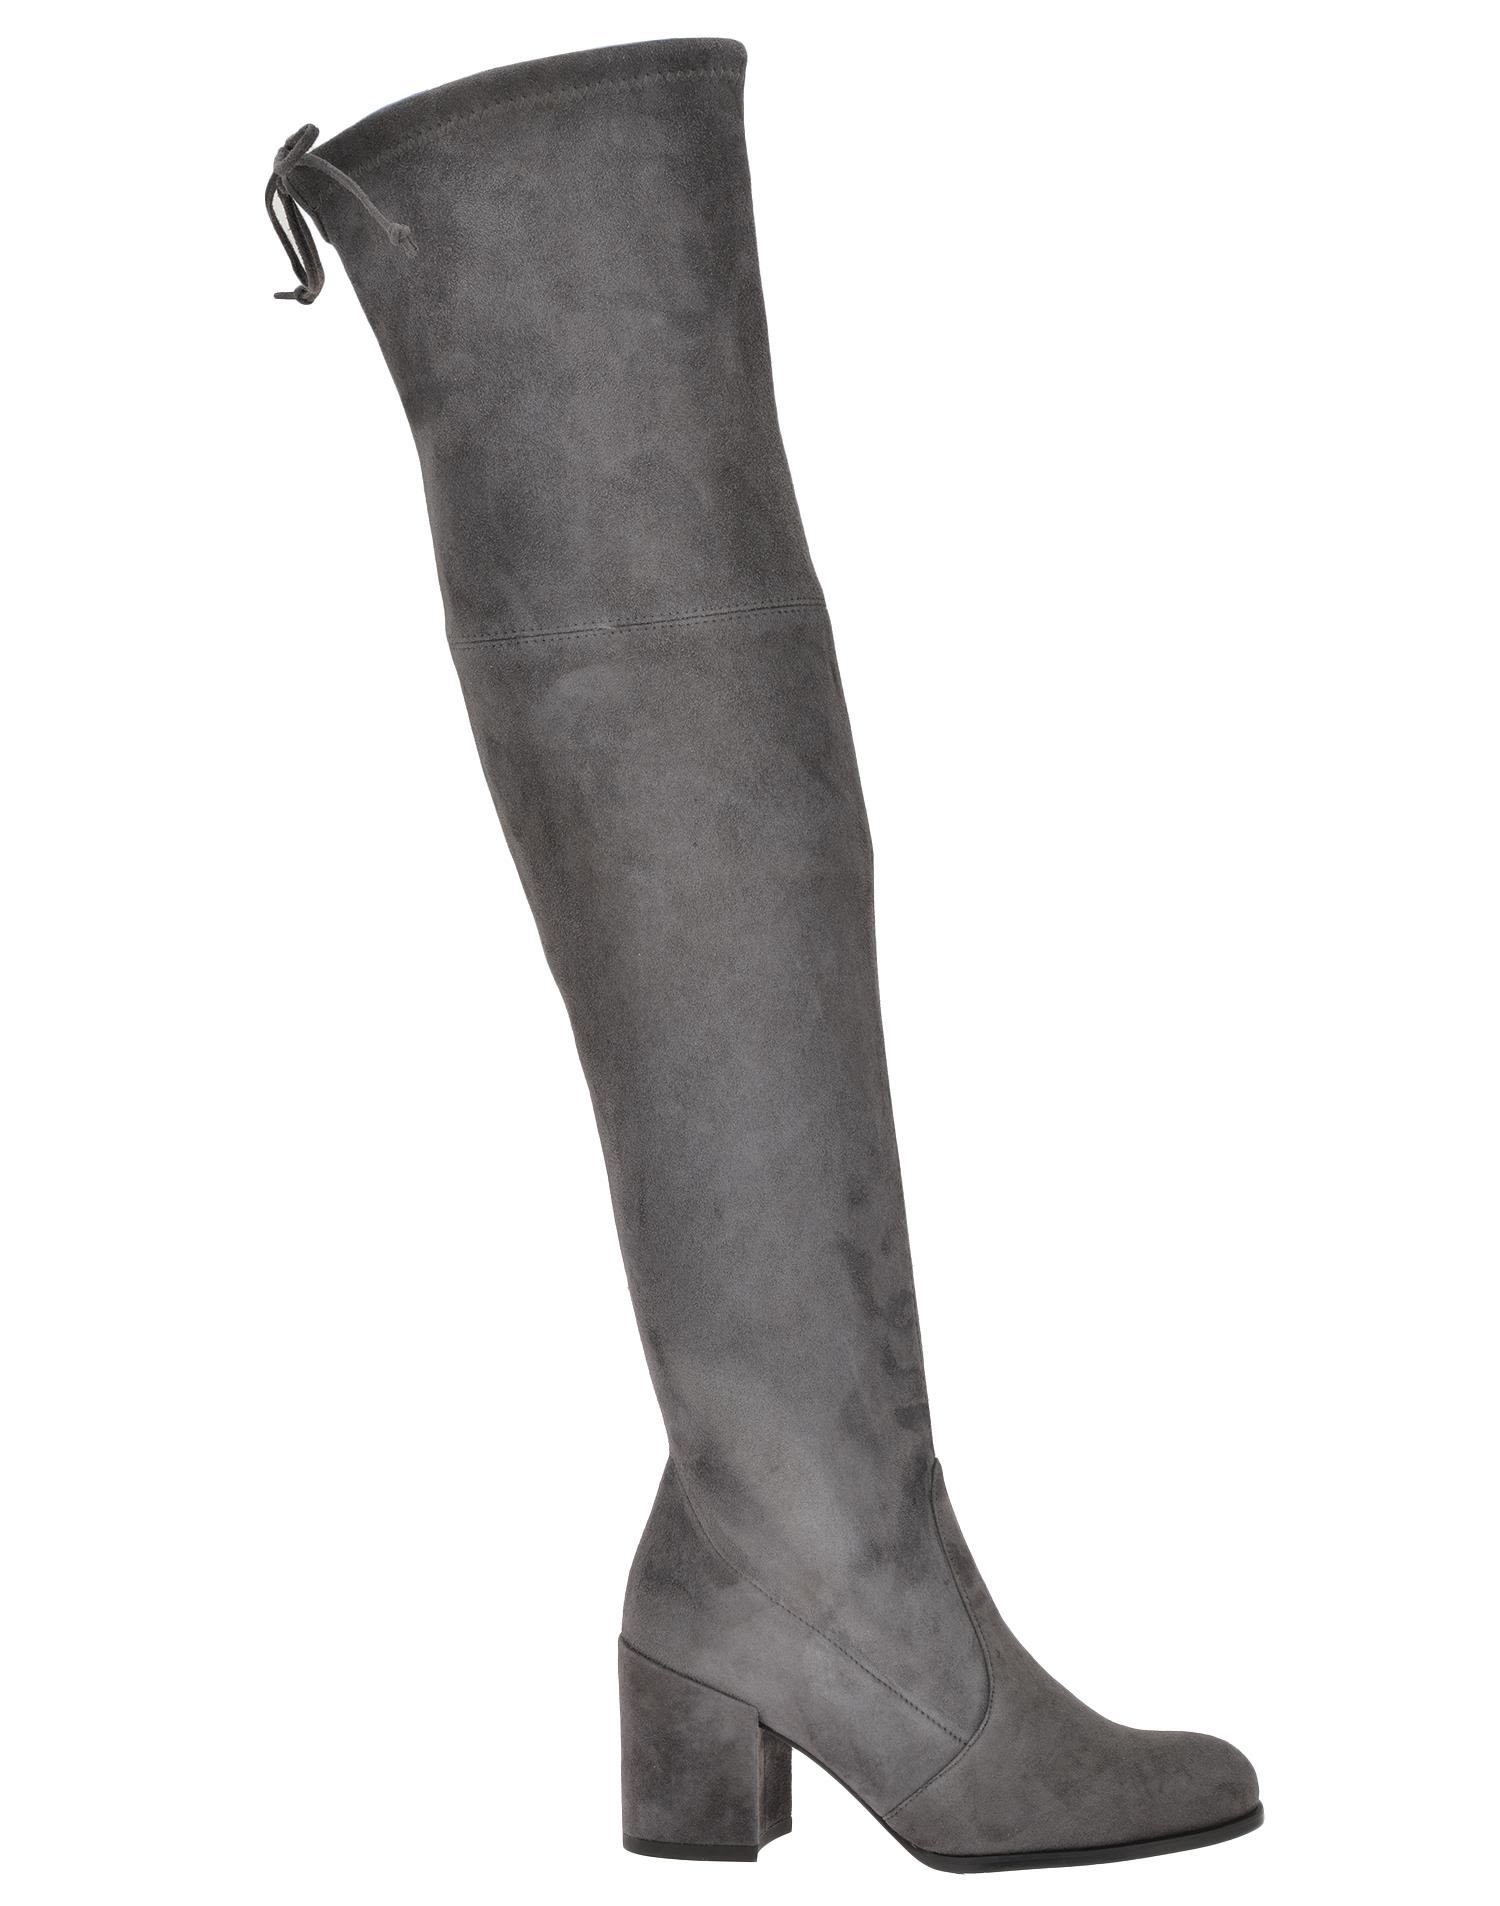 Stuart Weitzman Leather Cuissard Boot